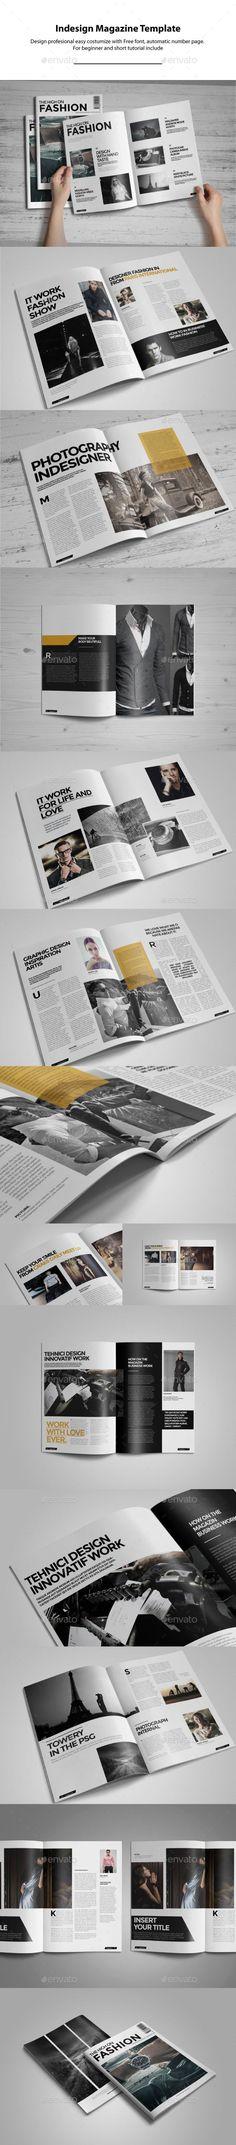 Indesign Magazine Template #design #journal Download: http://graphicriver.net/item/indesign-magazine-template/10635992?ref=ksioks